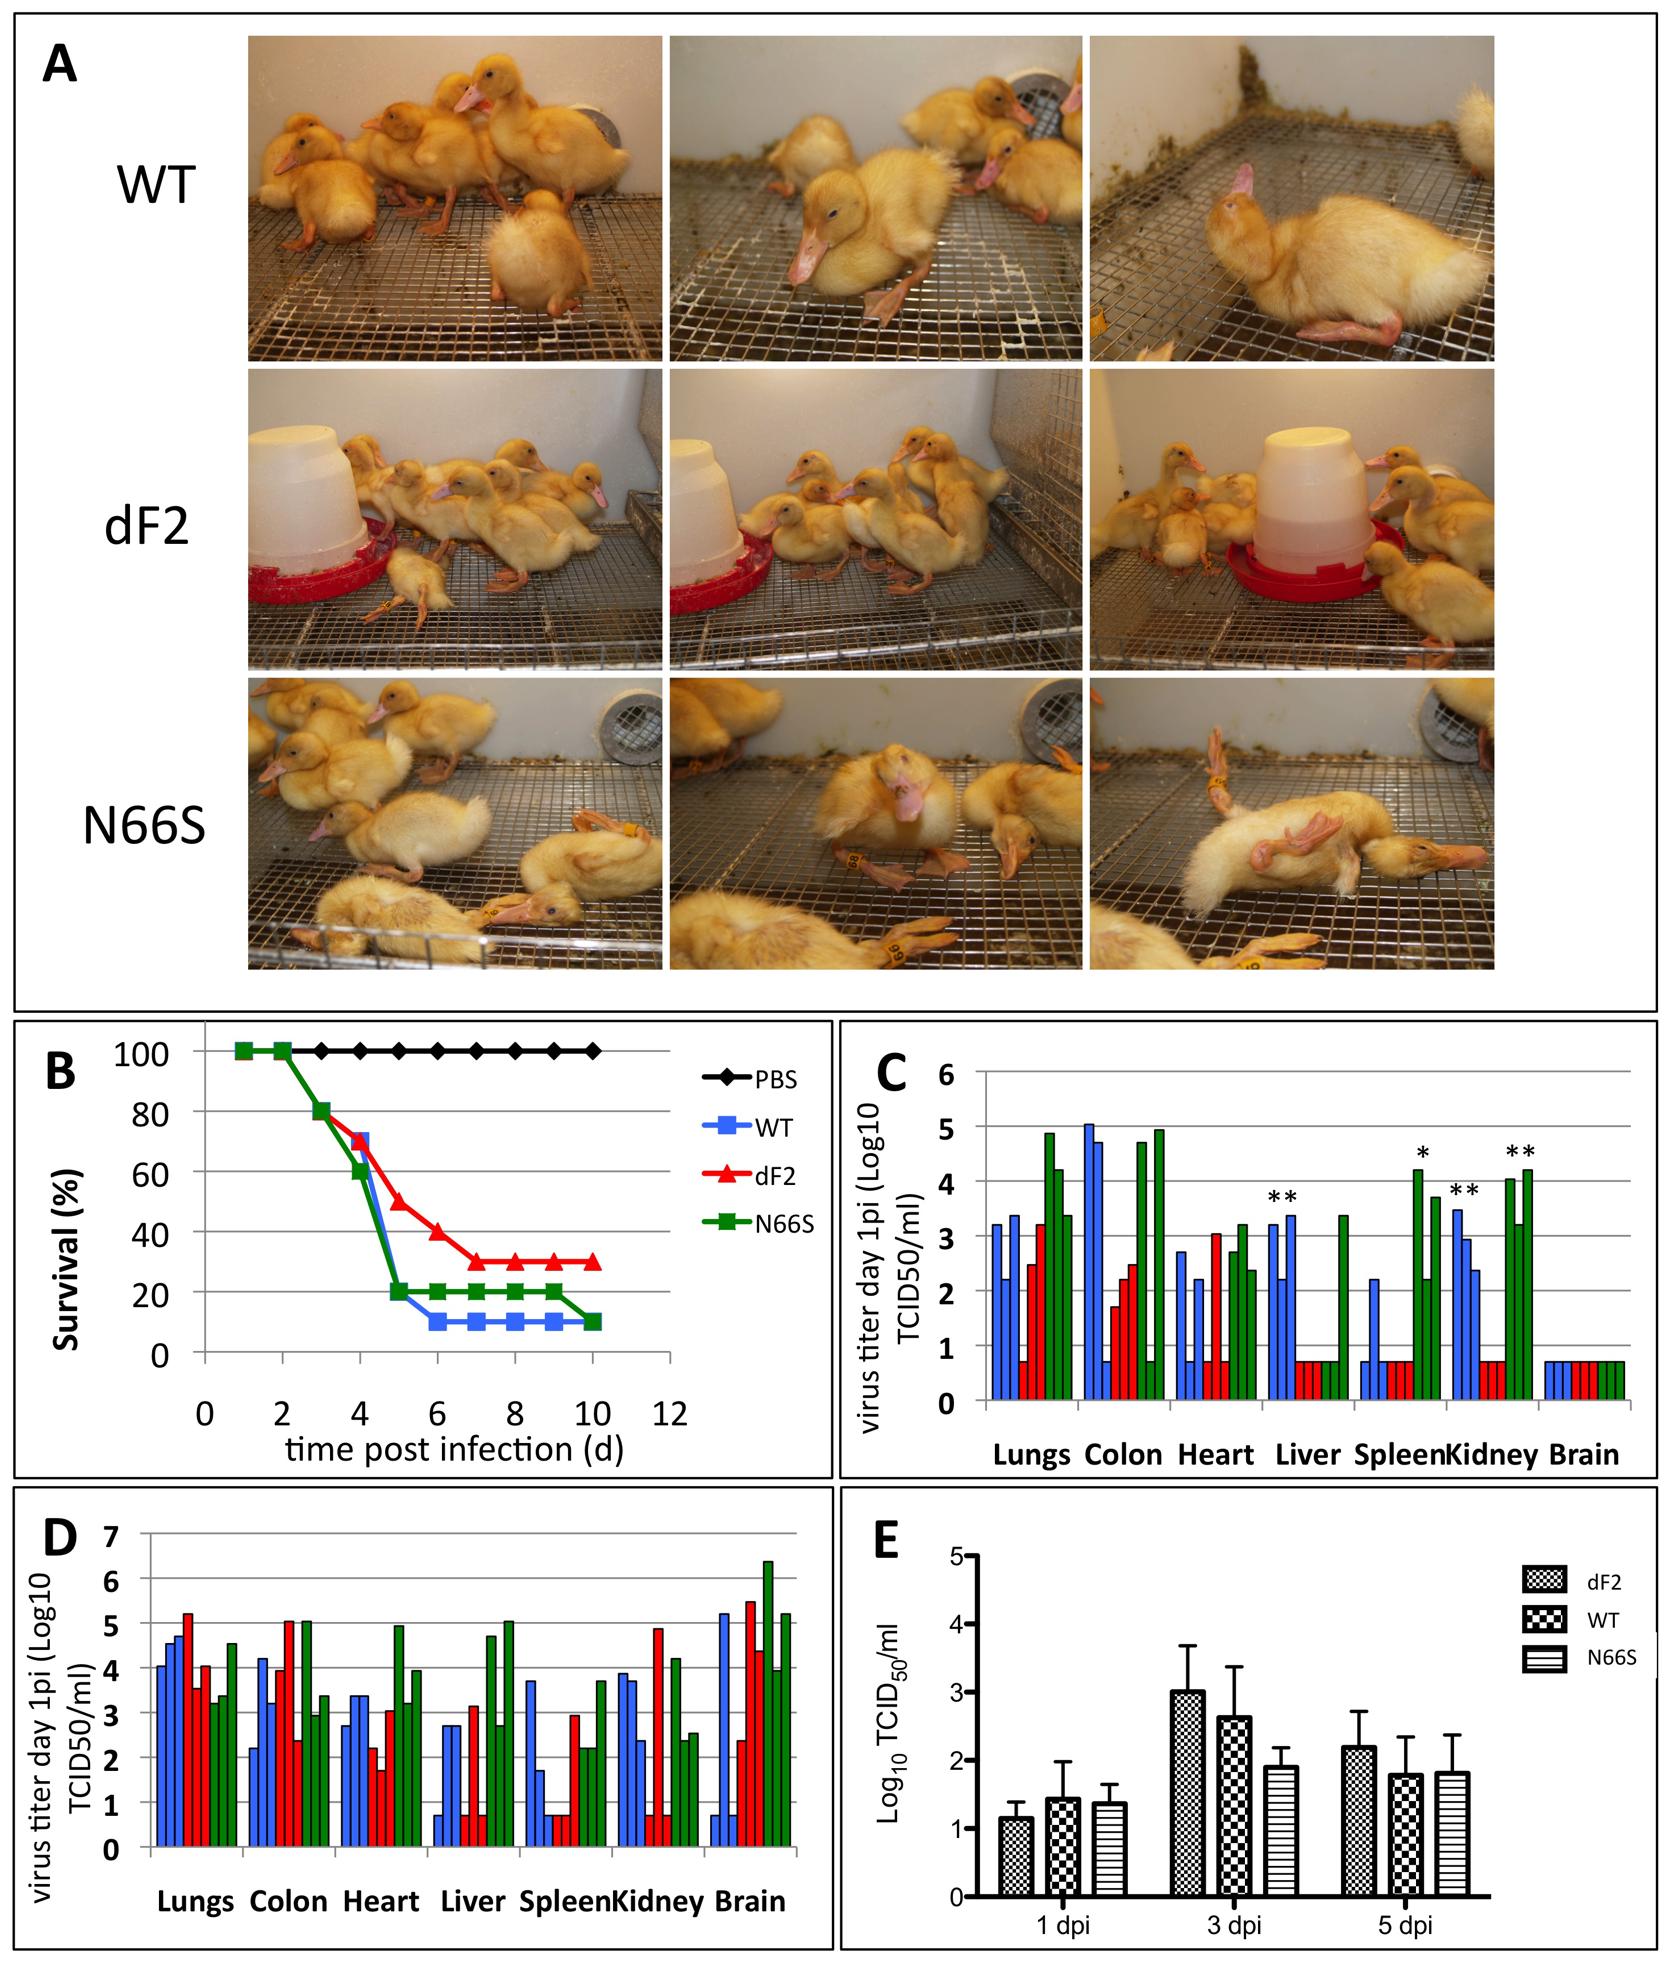 Diminished pathogenicity of PB1-F2 deficient virus in ducks.